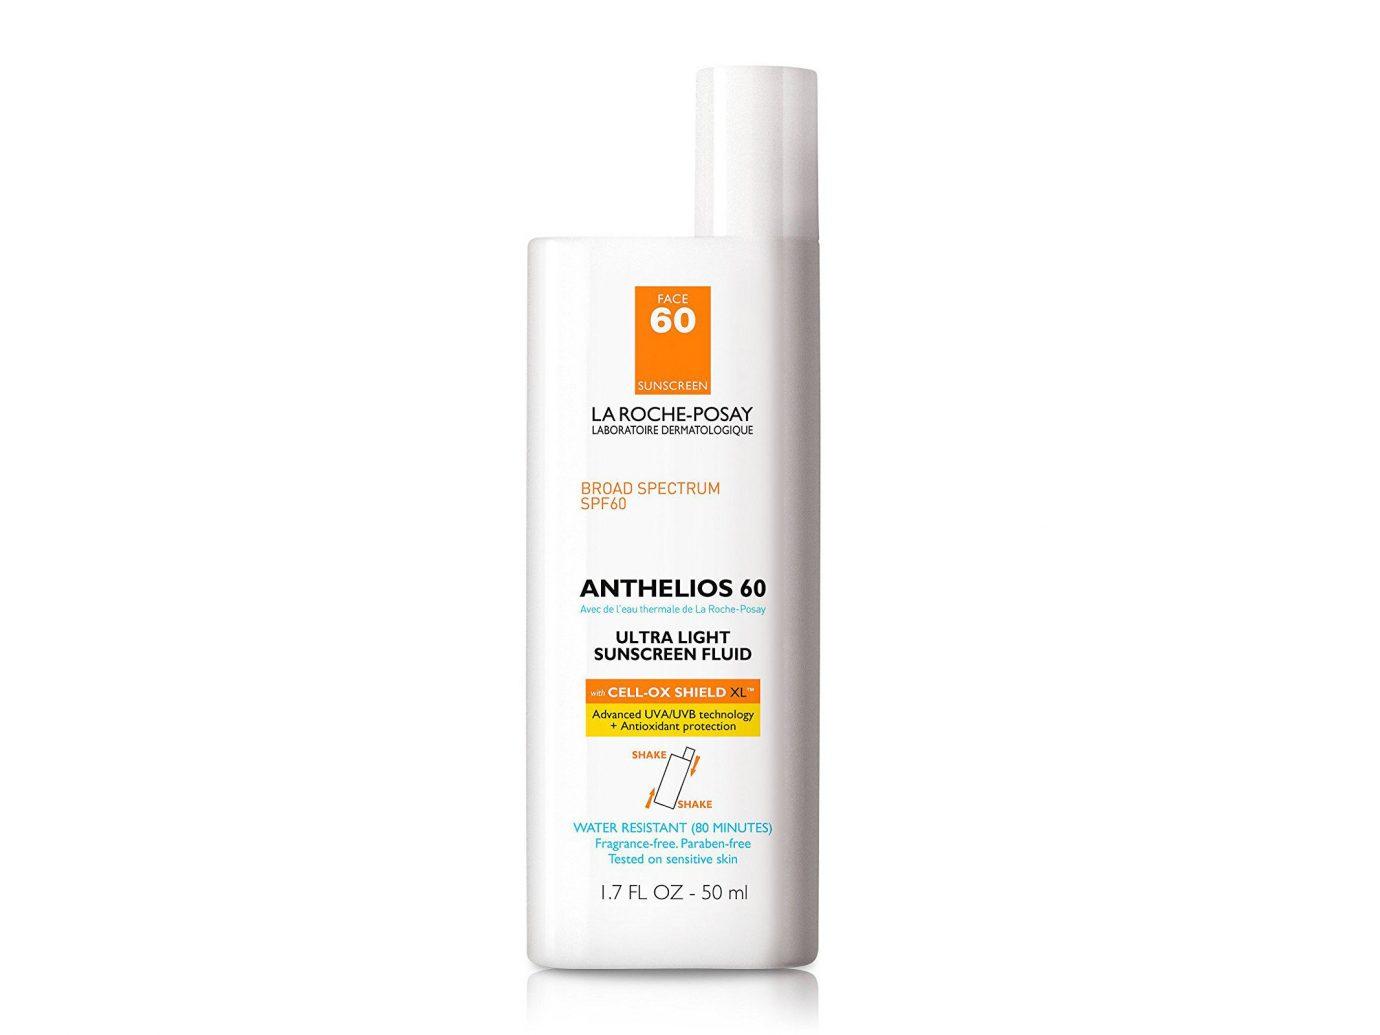 Beauty Health + Wellness Travel Shop toiletry product skin care lotion health & beauty sunscreen